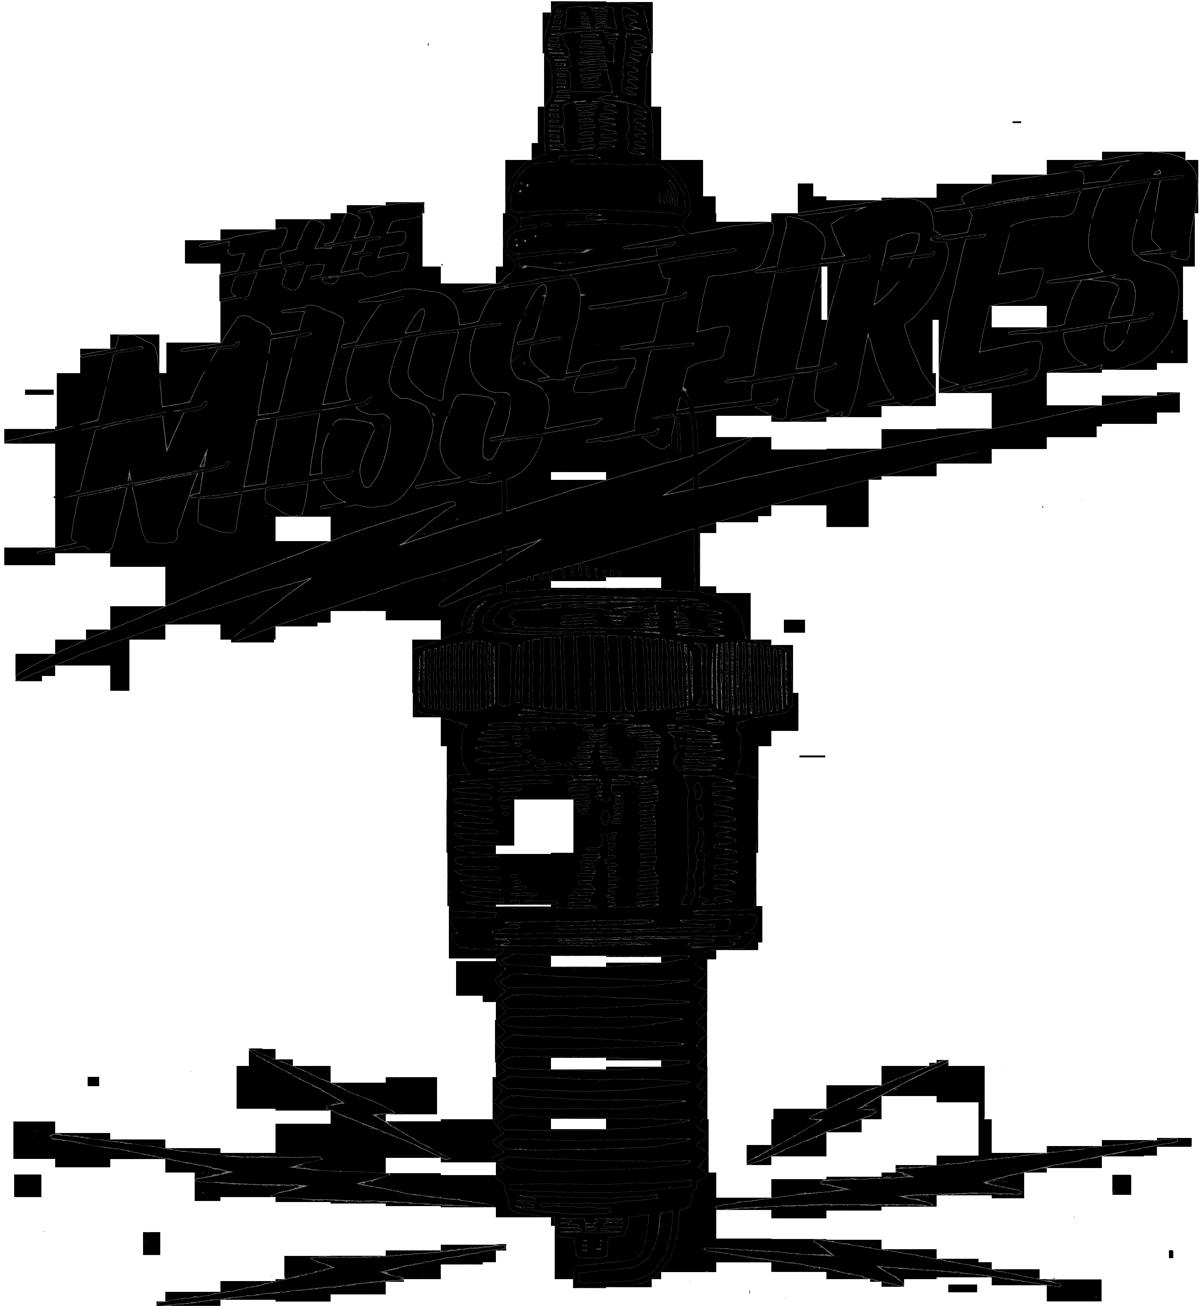 MF-spark-plug-caps-logo-1200.png